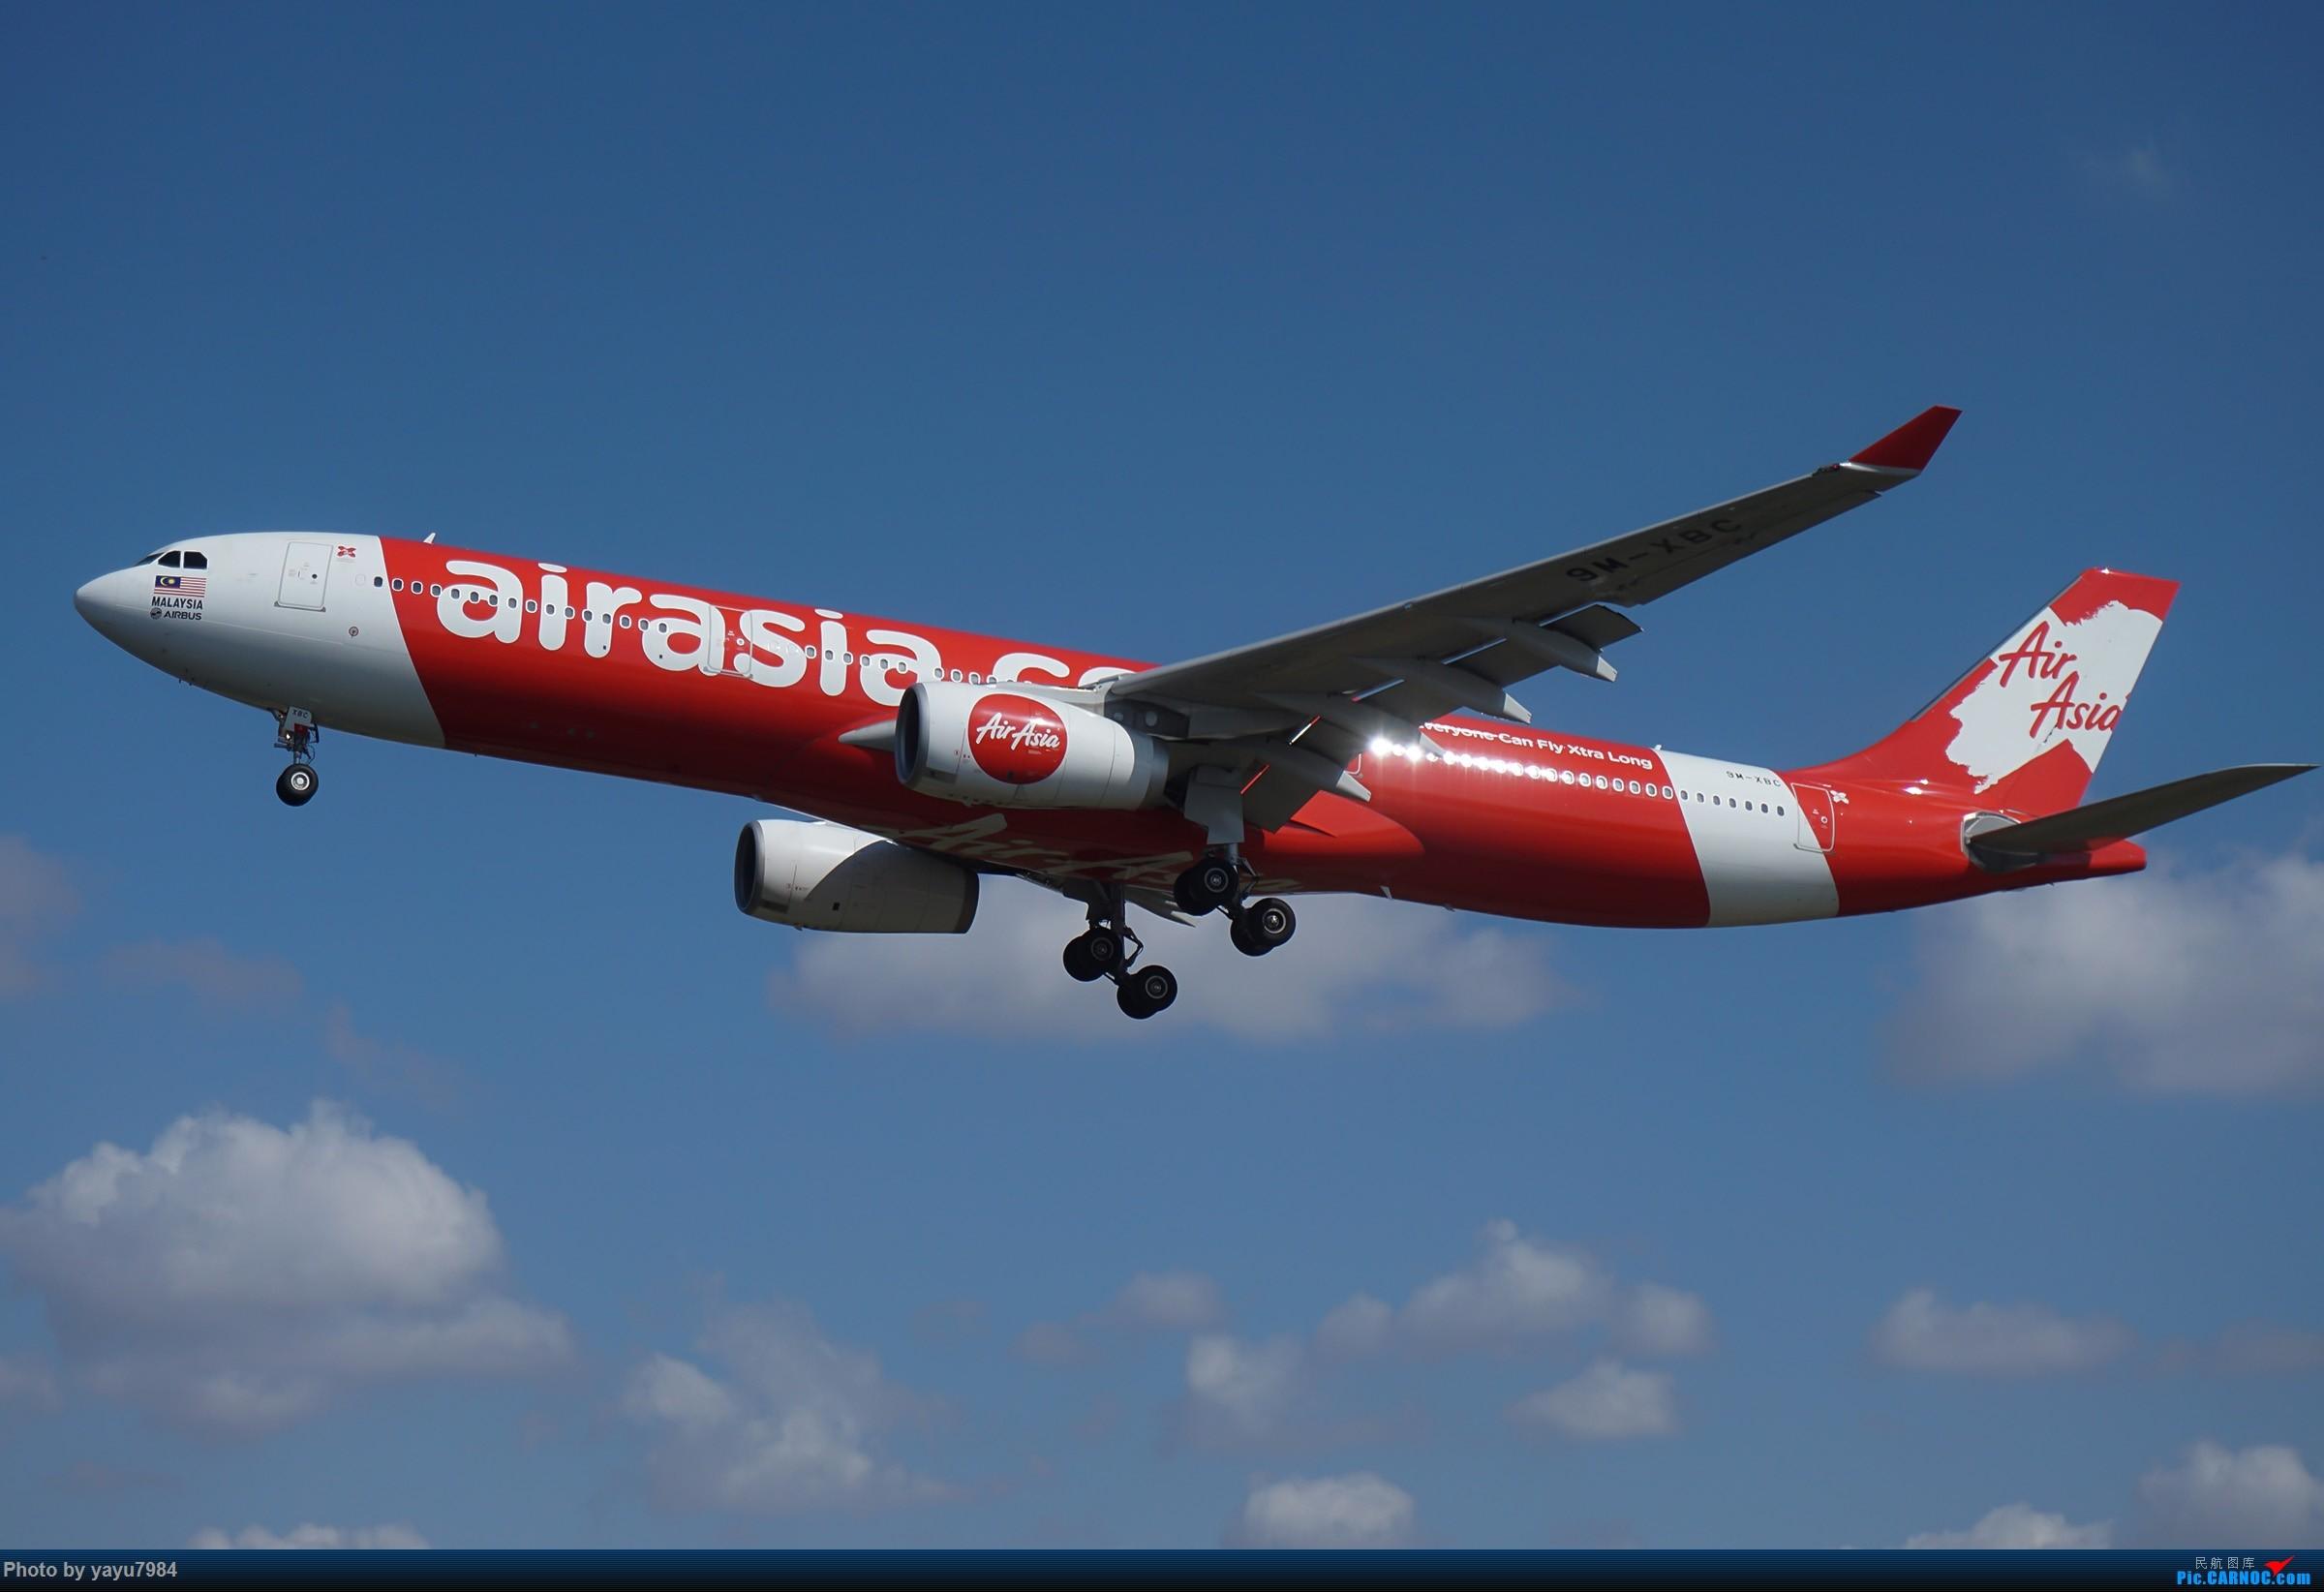 Re:[原创][SYD] 东航天合332,雪绒花343,华航蓝鹊,以及其他日常货 AIRBUS A330-300 9M-XBC 澳大利亚悉尼金斯福德·史密斯机场